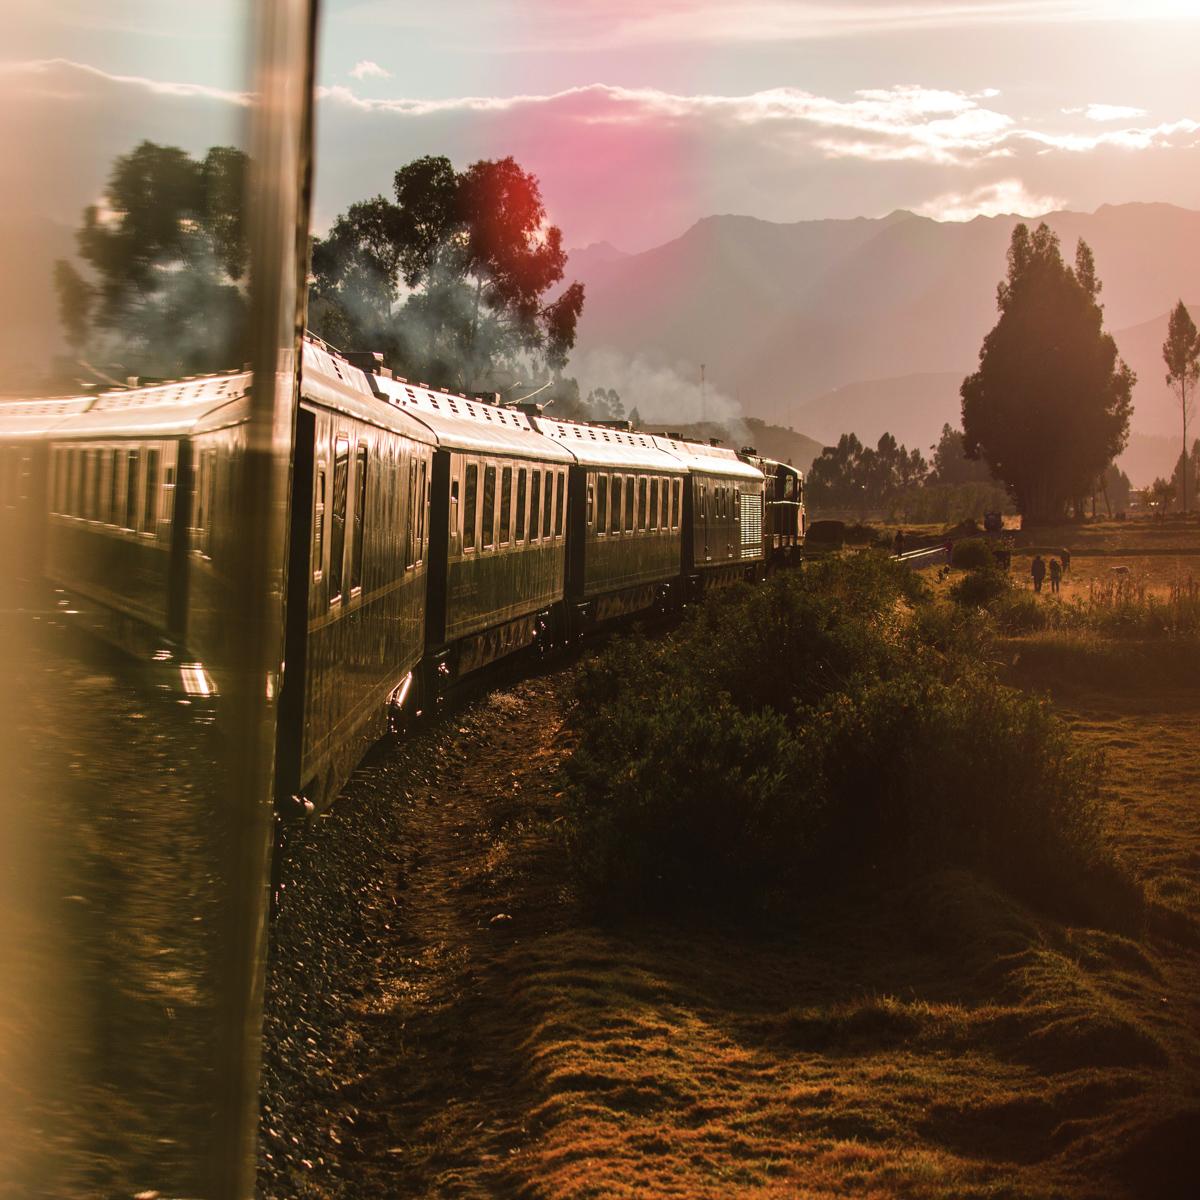 Belmond Hiram Bingham – Mit dem Zug zum Machu Picchu-9